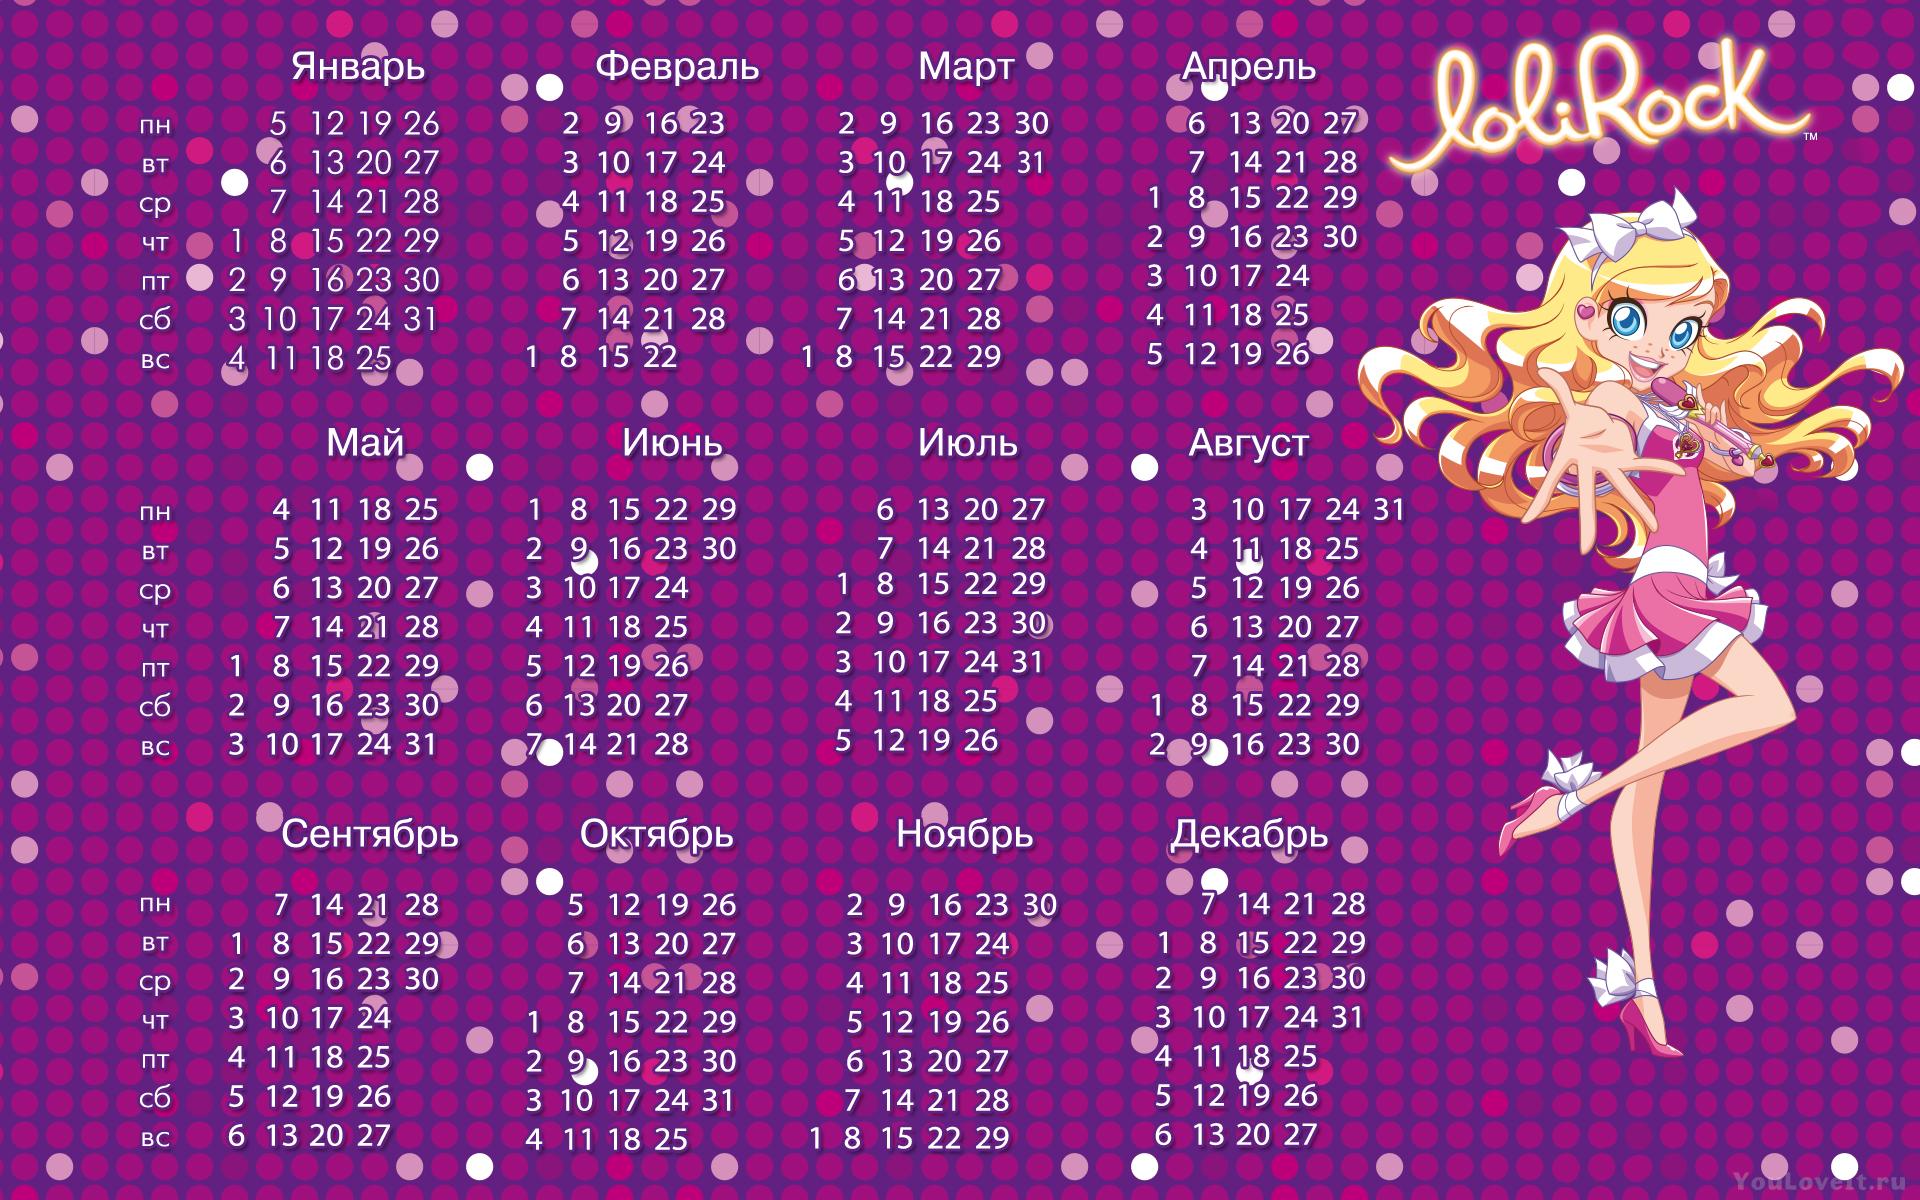 Фазы луны в 2017 году календарь фаз таблица